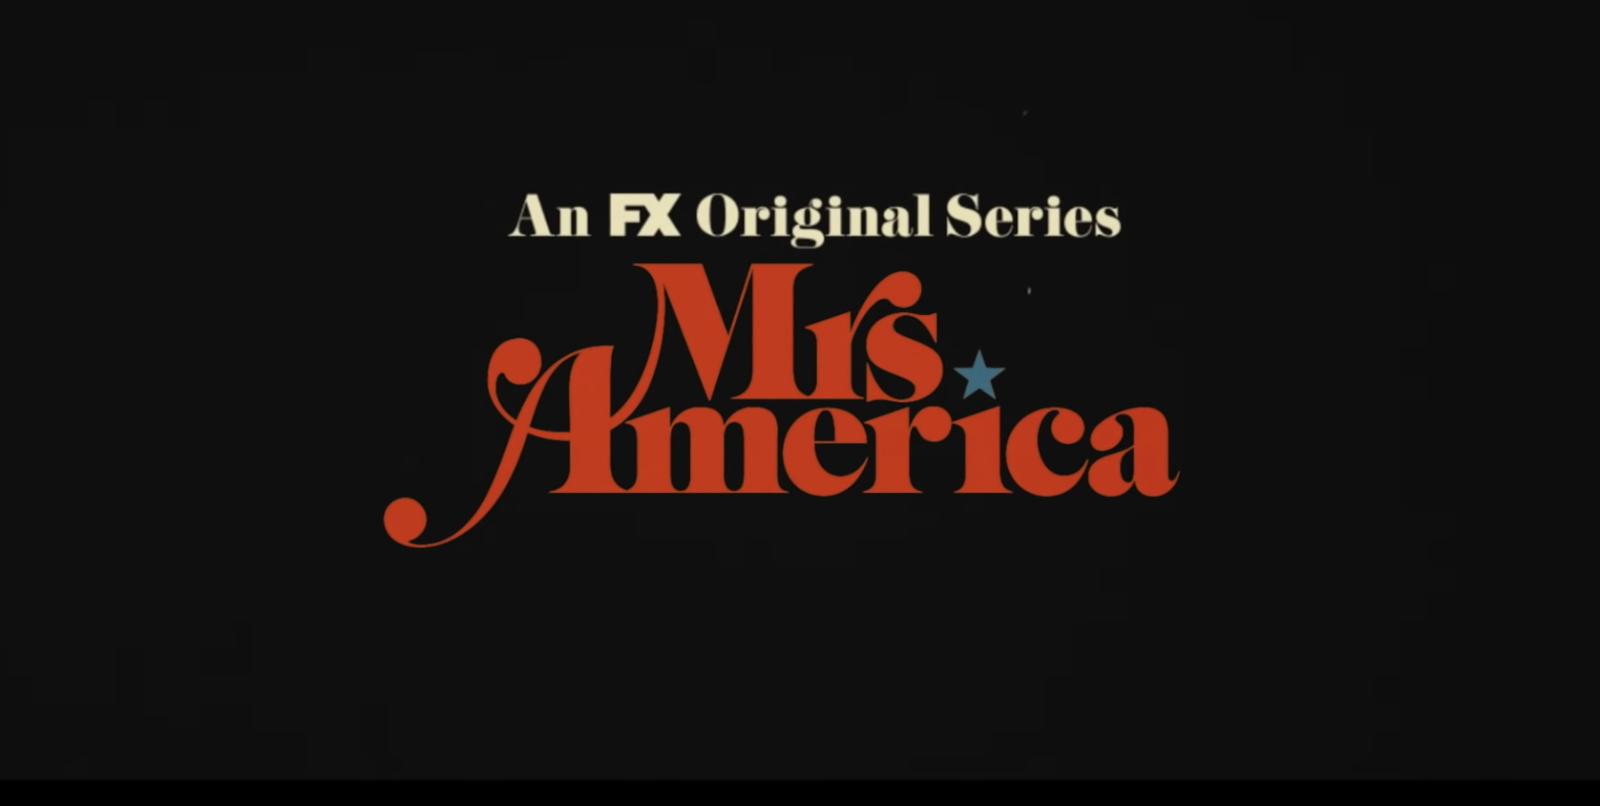 America mrs